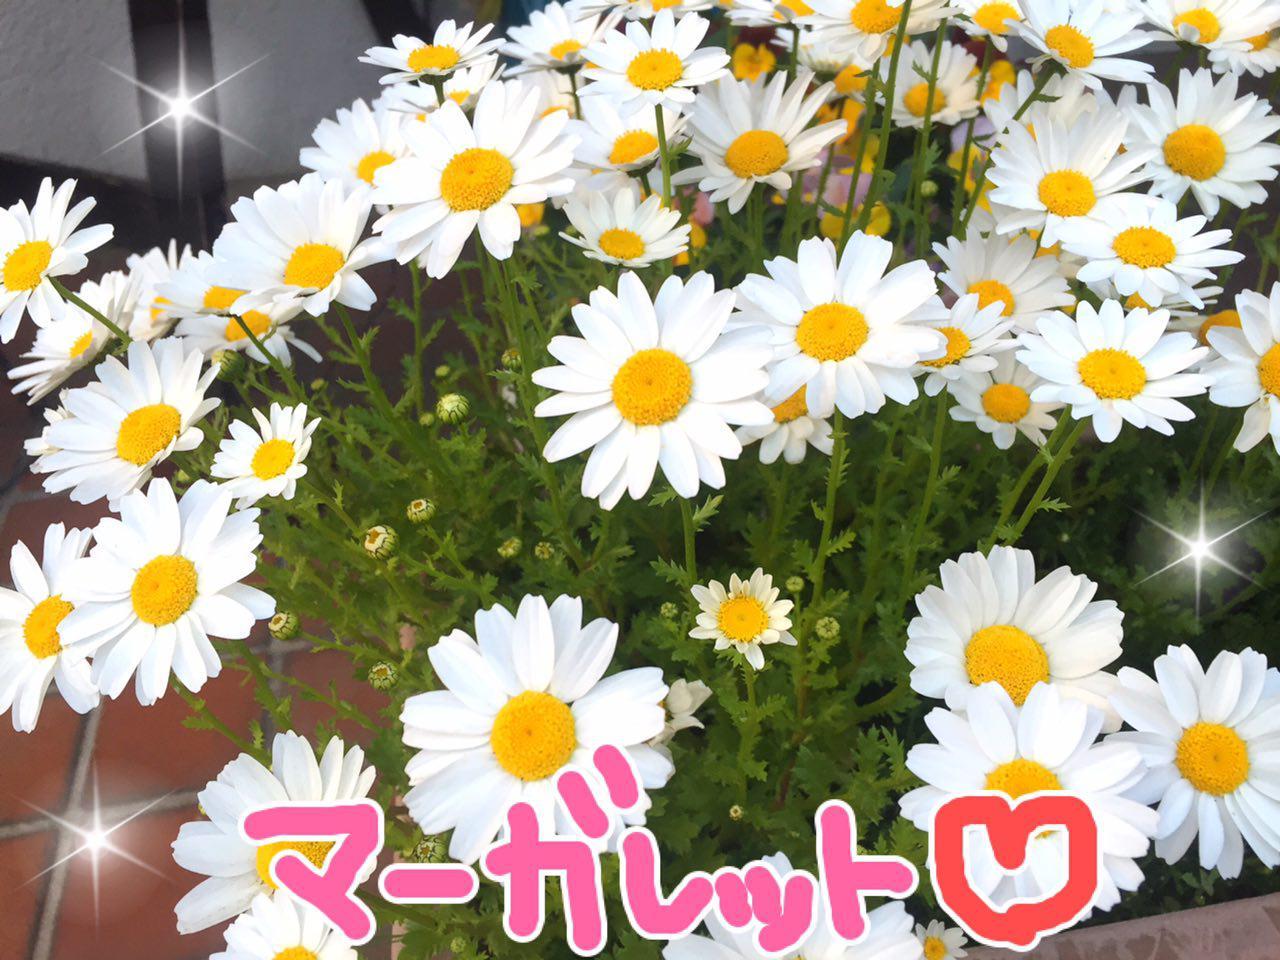 photo_2017-04-15_22-59-25.jpg